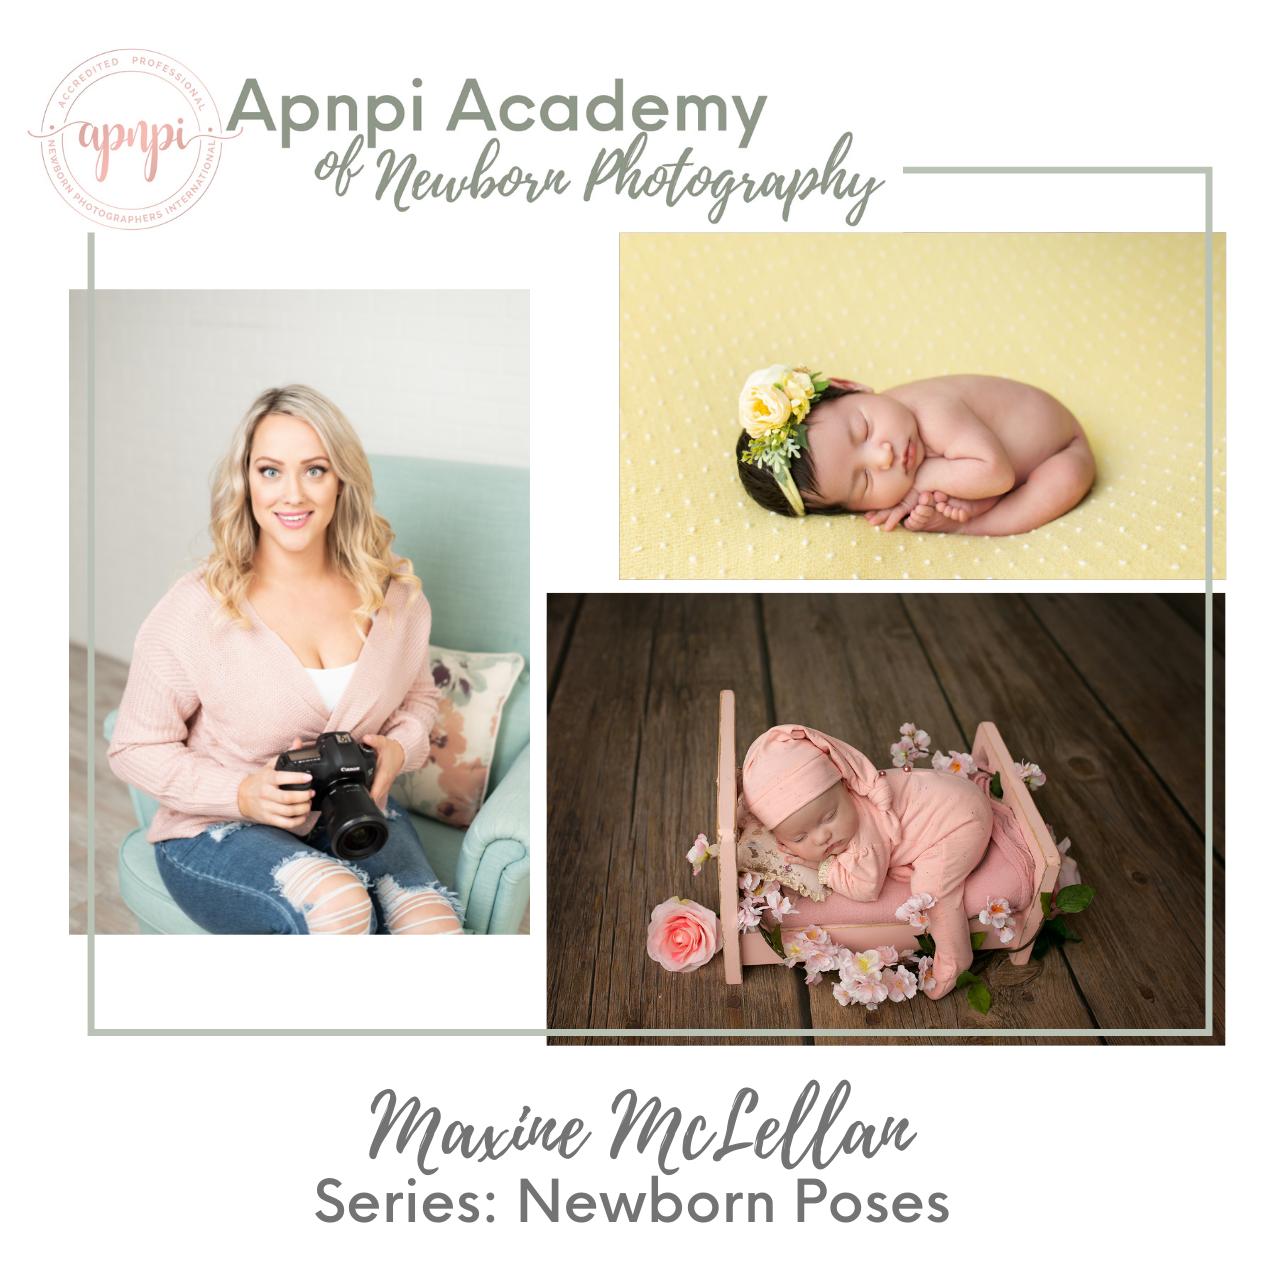 Maxine McLellan Oh So Savvy Newborn Posing APNPI Academy Course